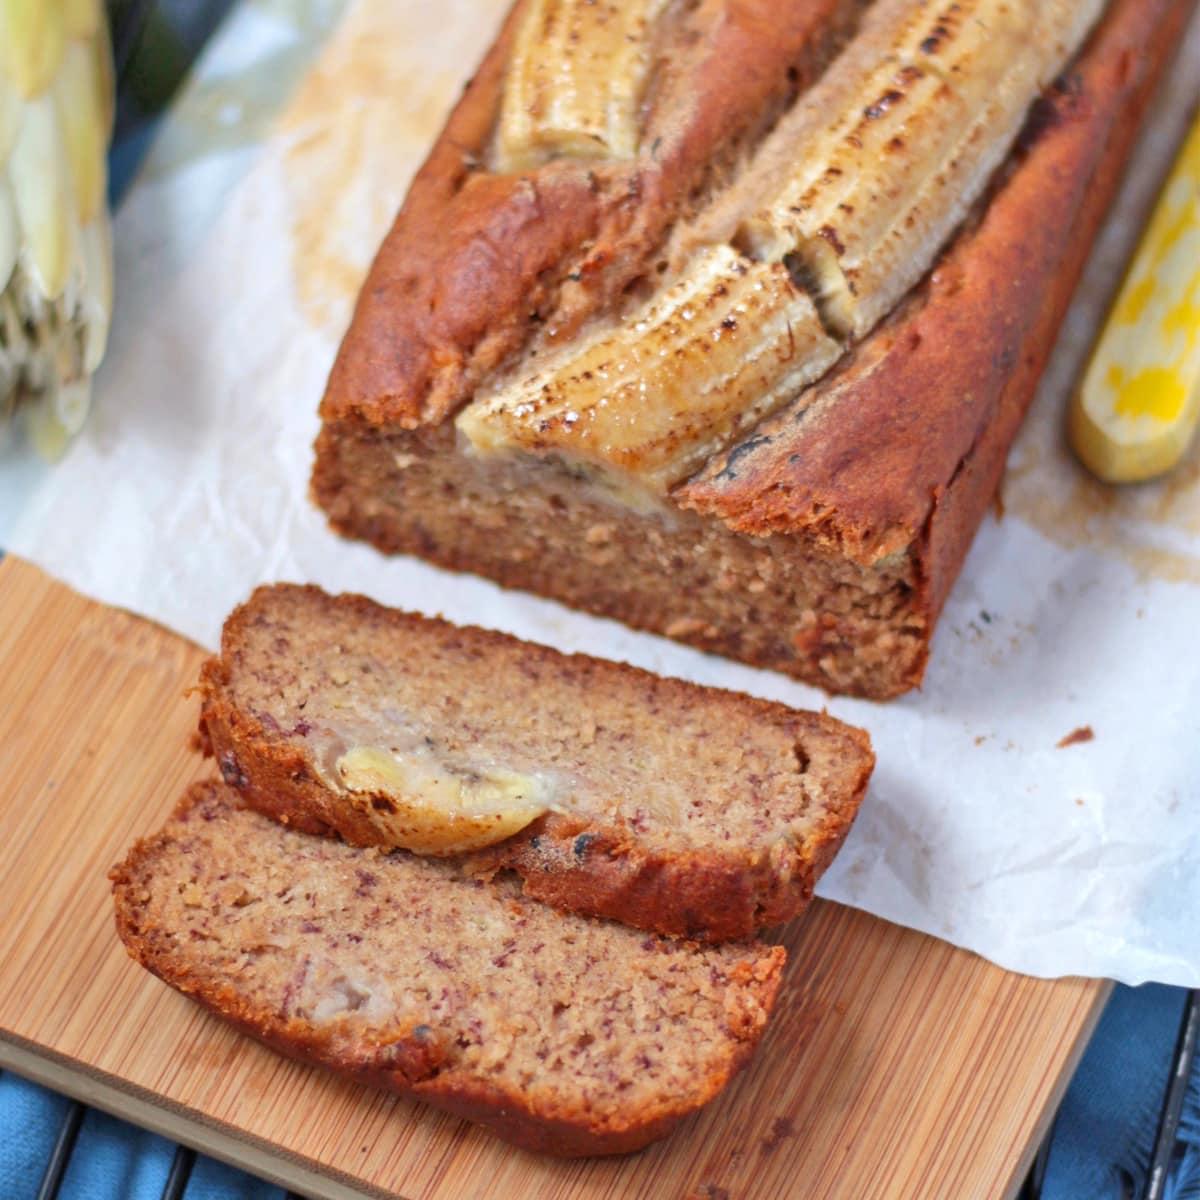 Two slices of Vegan Banana Bread